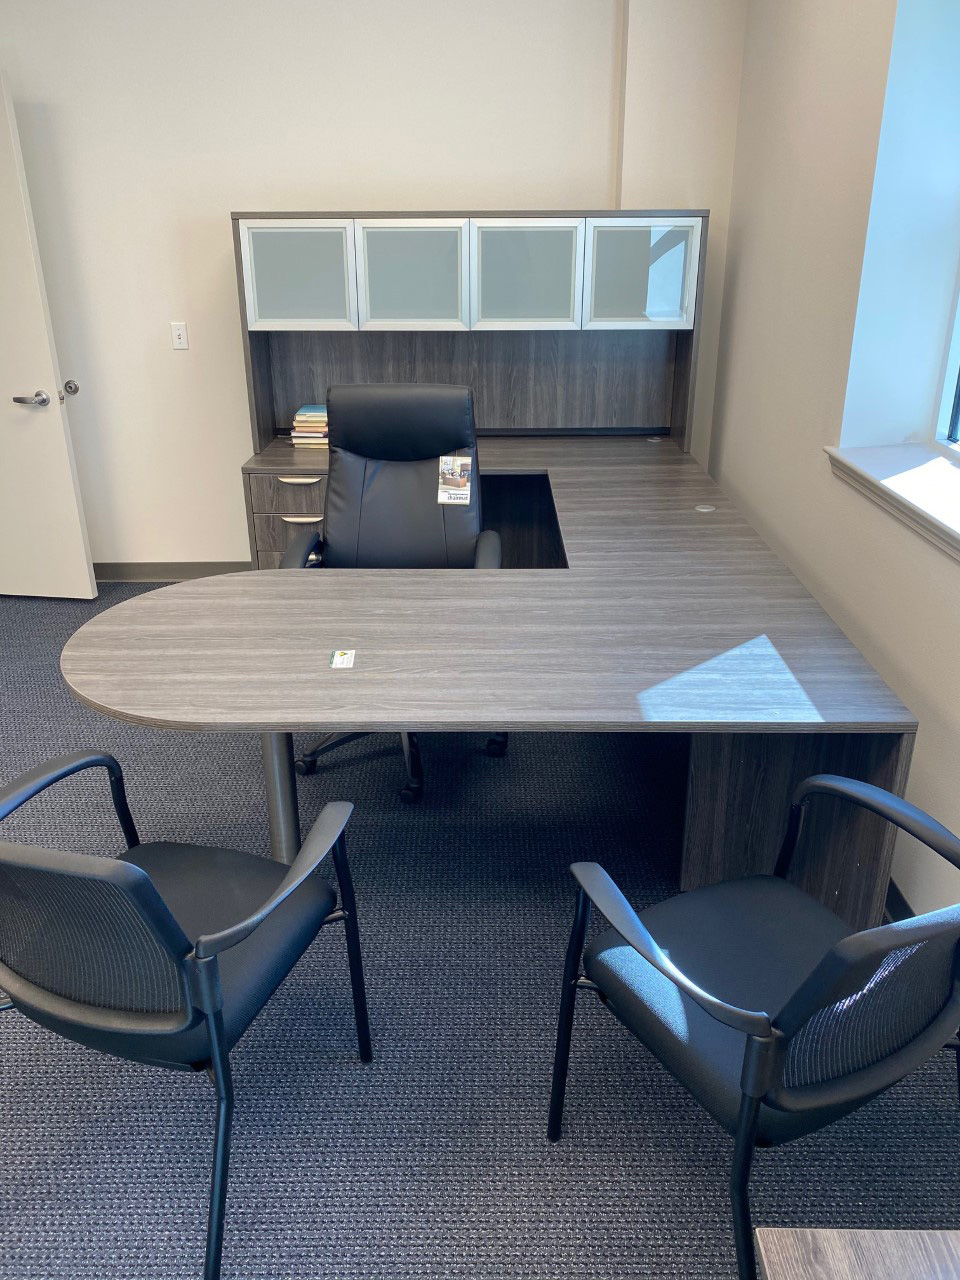 office-cubicle-furniture-suppliers-in-bradenton-florida-12-.jpg